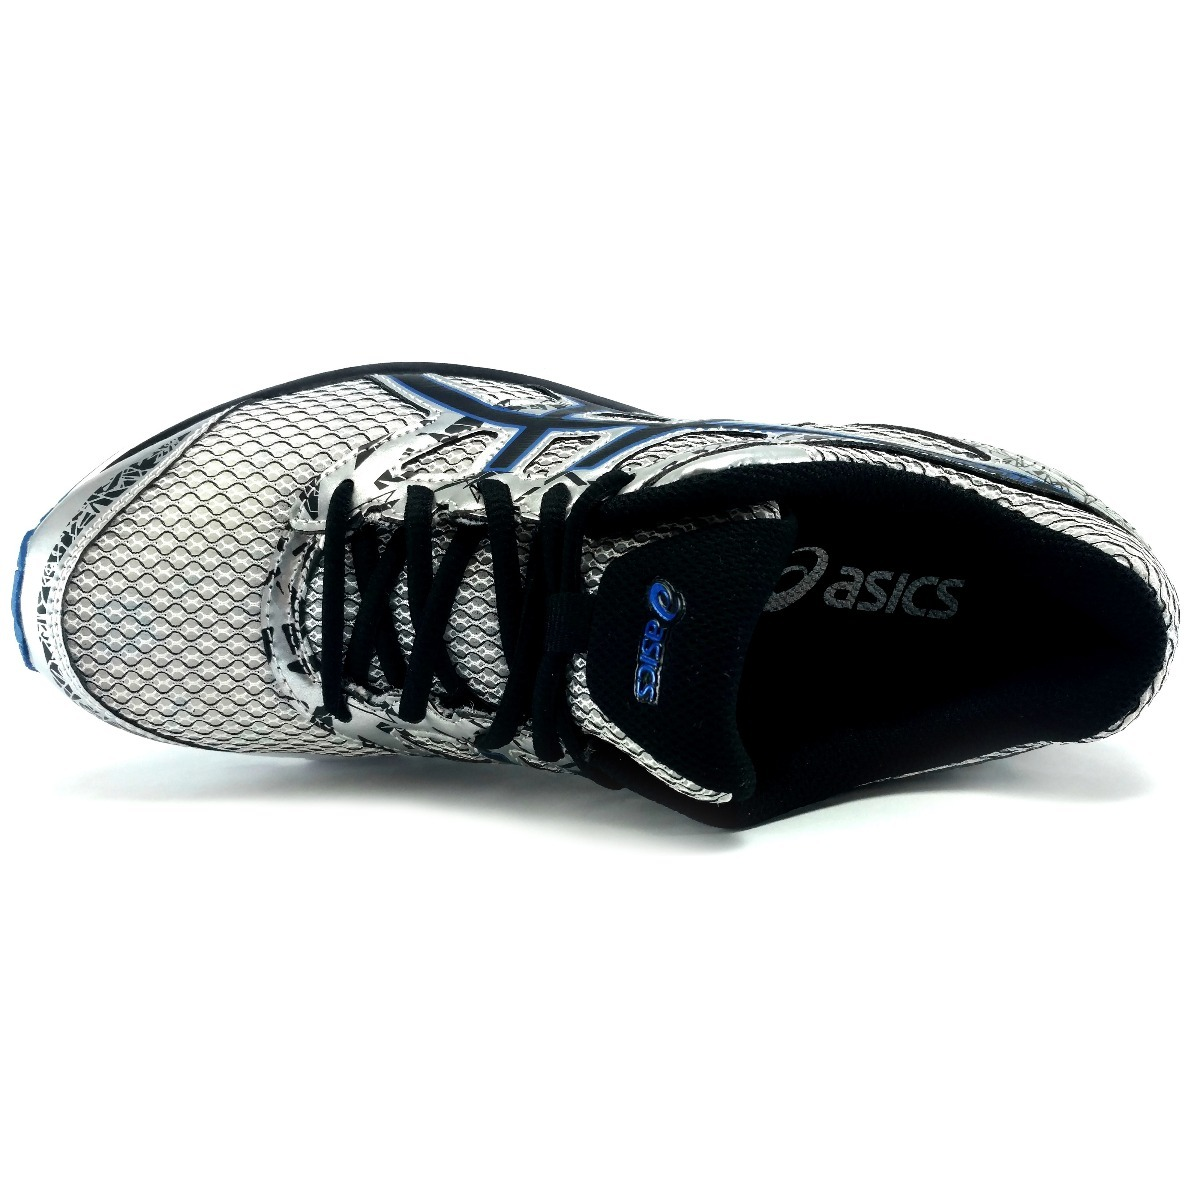 a59ea4440ba tenis asics gel excite 4 azul plata correr supinador. Cargando zoom.